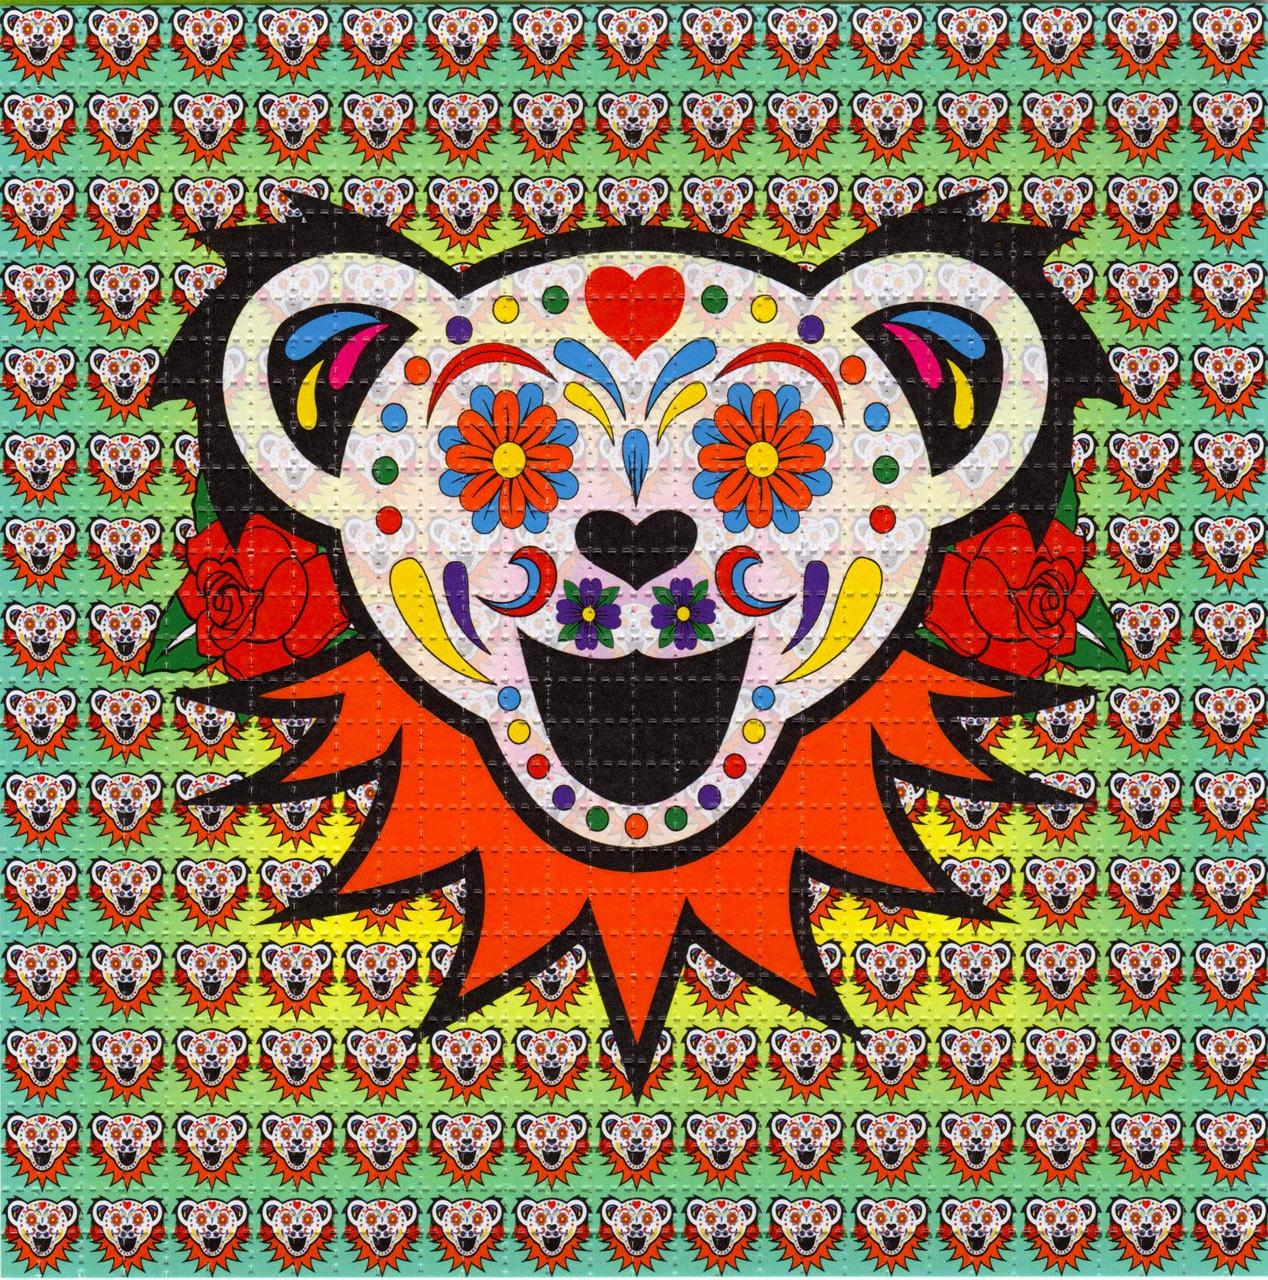 Phish Hd Wallpaper Sugar Bear Grateful Dead Blotter Art Perforated Acid Art